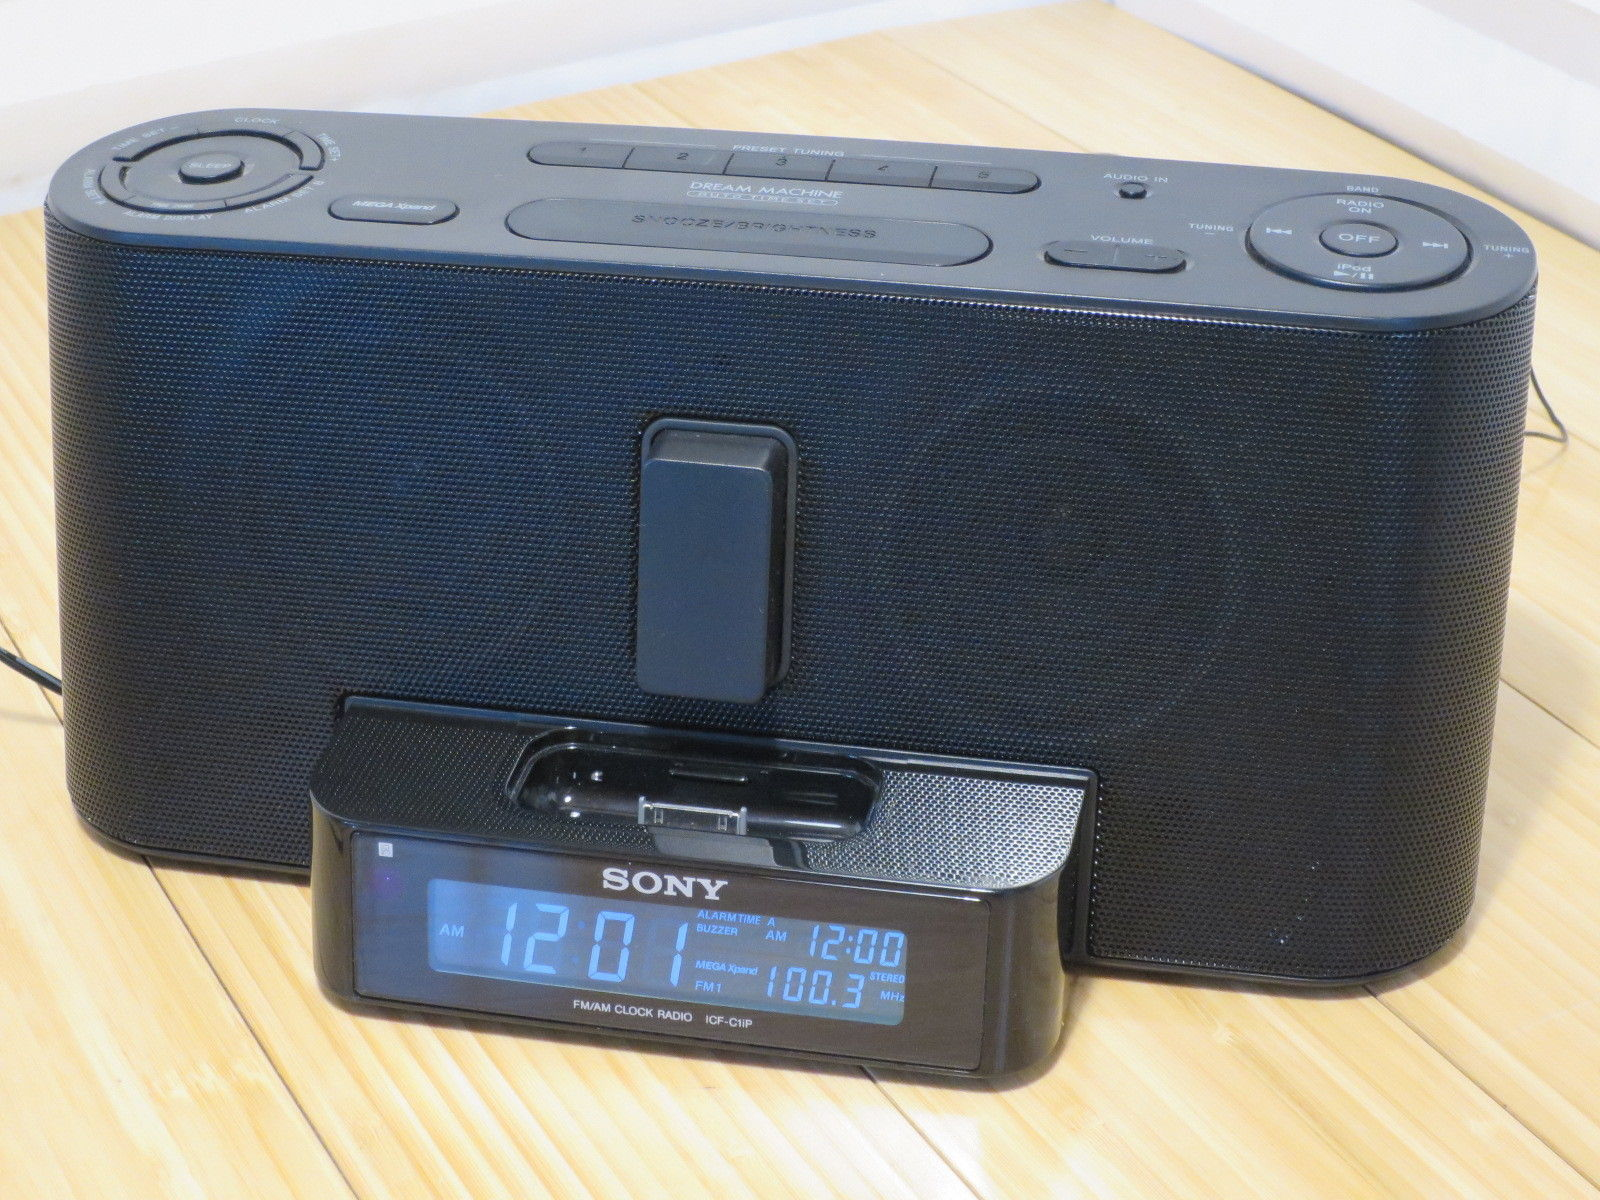 Sony Dream Machine Amfm Clock Alarm Radio And 10 Similar Items